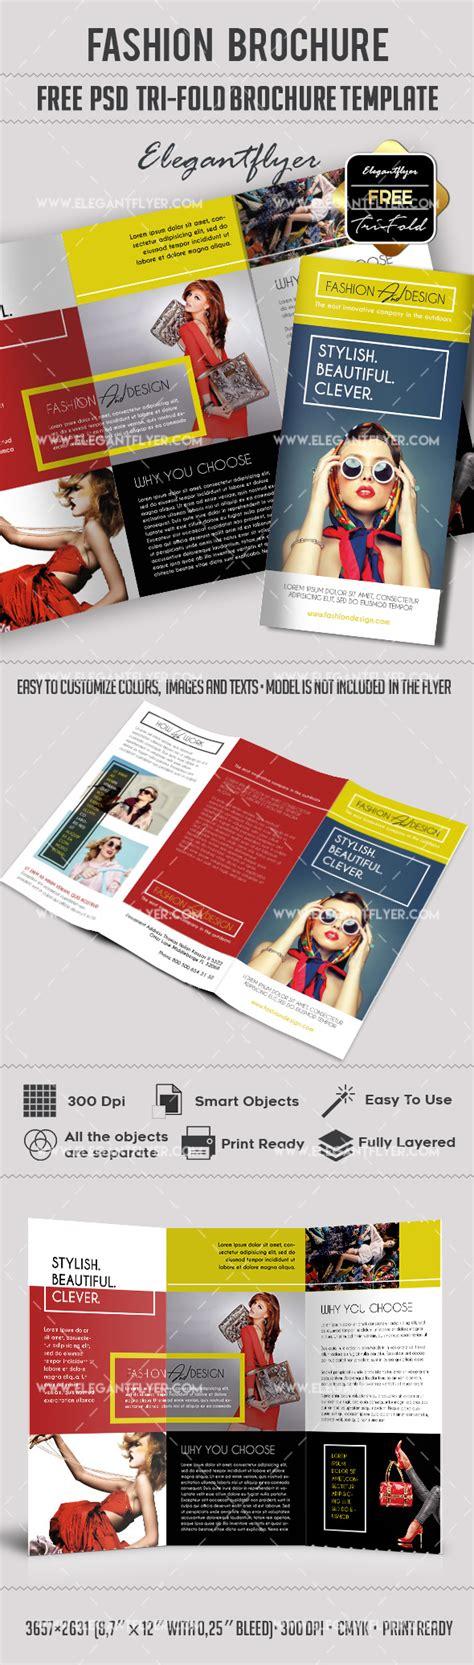 Fashion Free Tri Fold Psd Brochure Template By Elegantflyer Tri Fold Brochure Template Psd Free